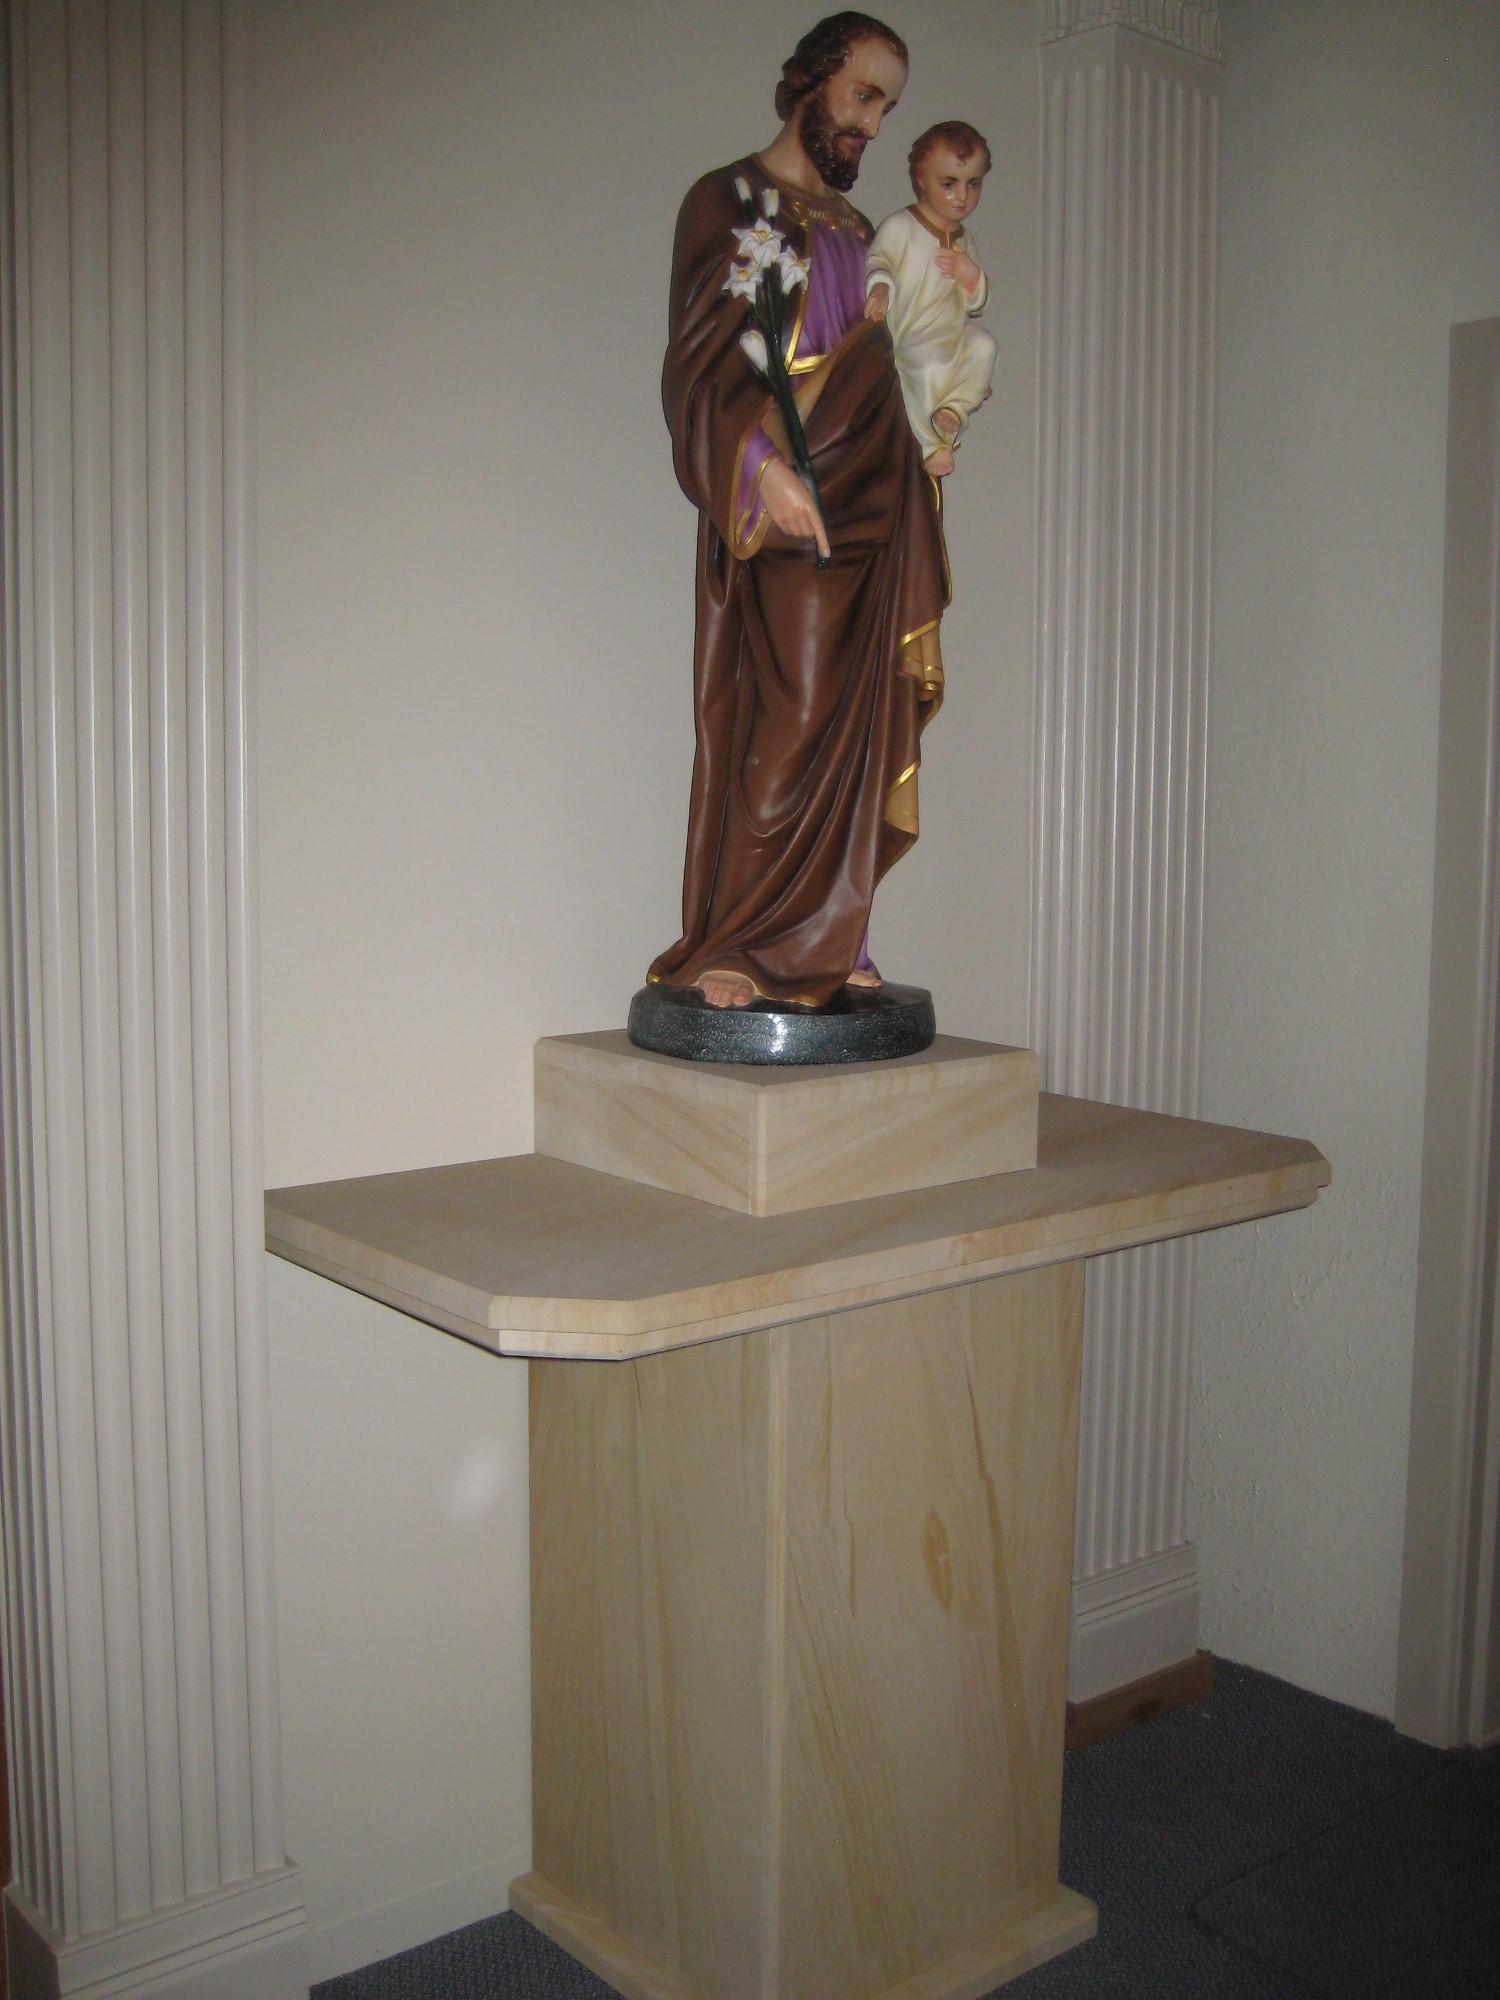 076 Woodgrain sandstone pedestal  for churche. We make furniture to order..jpg